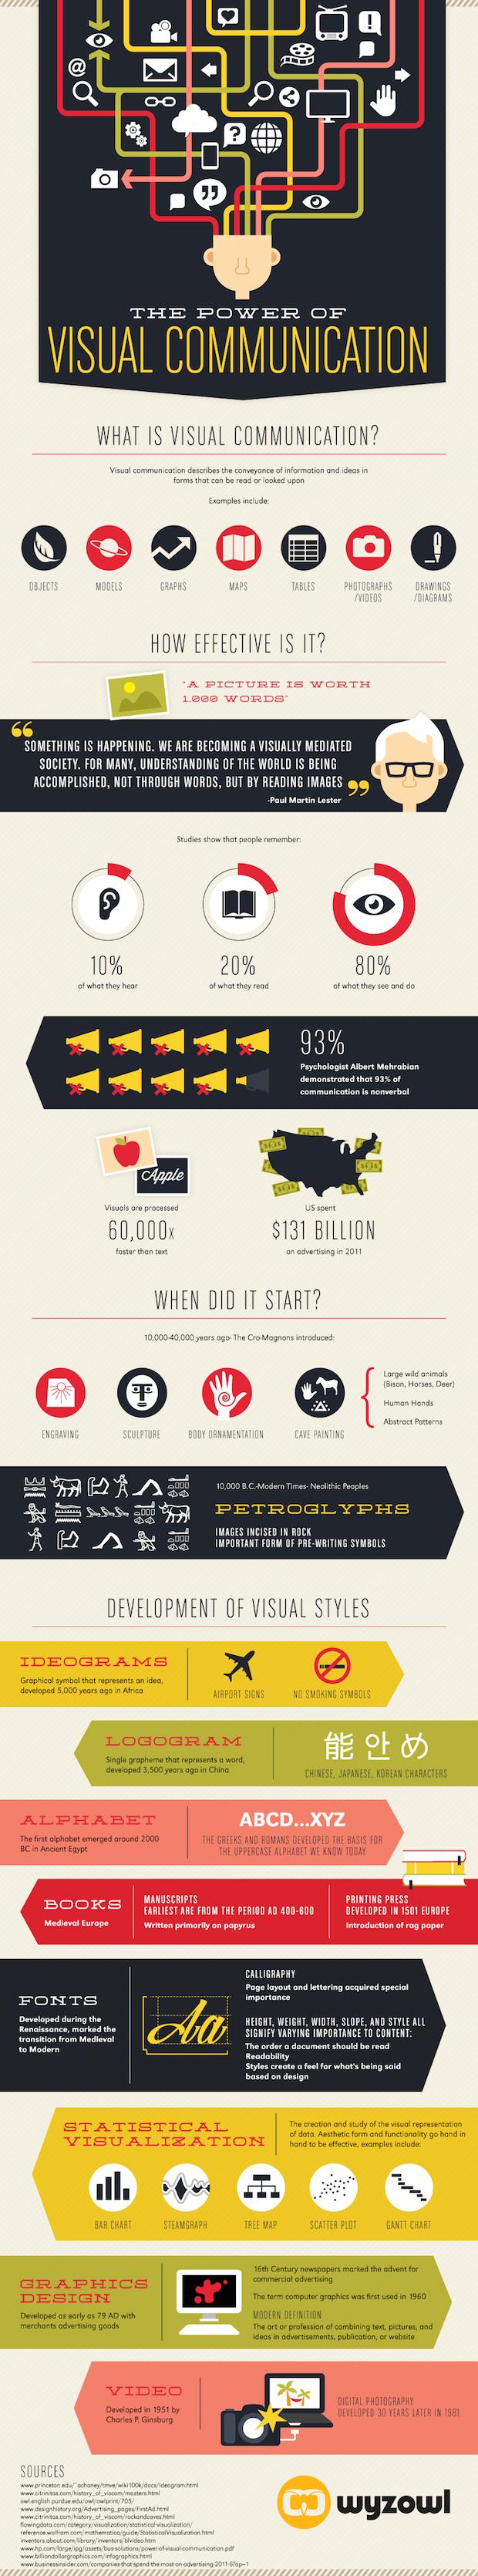 Vijf waardevolle insights over visual content in infographics - Content Marketing Management